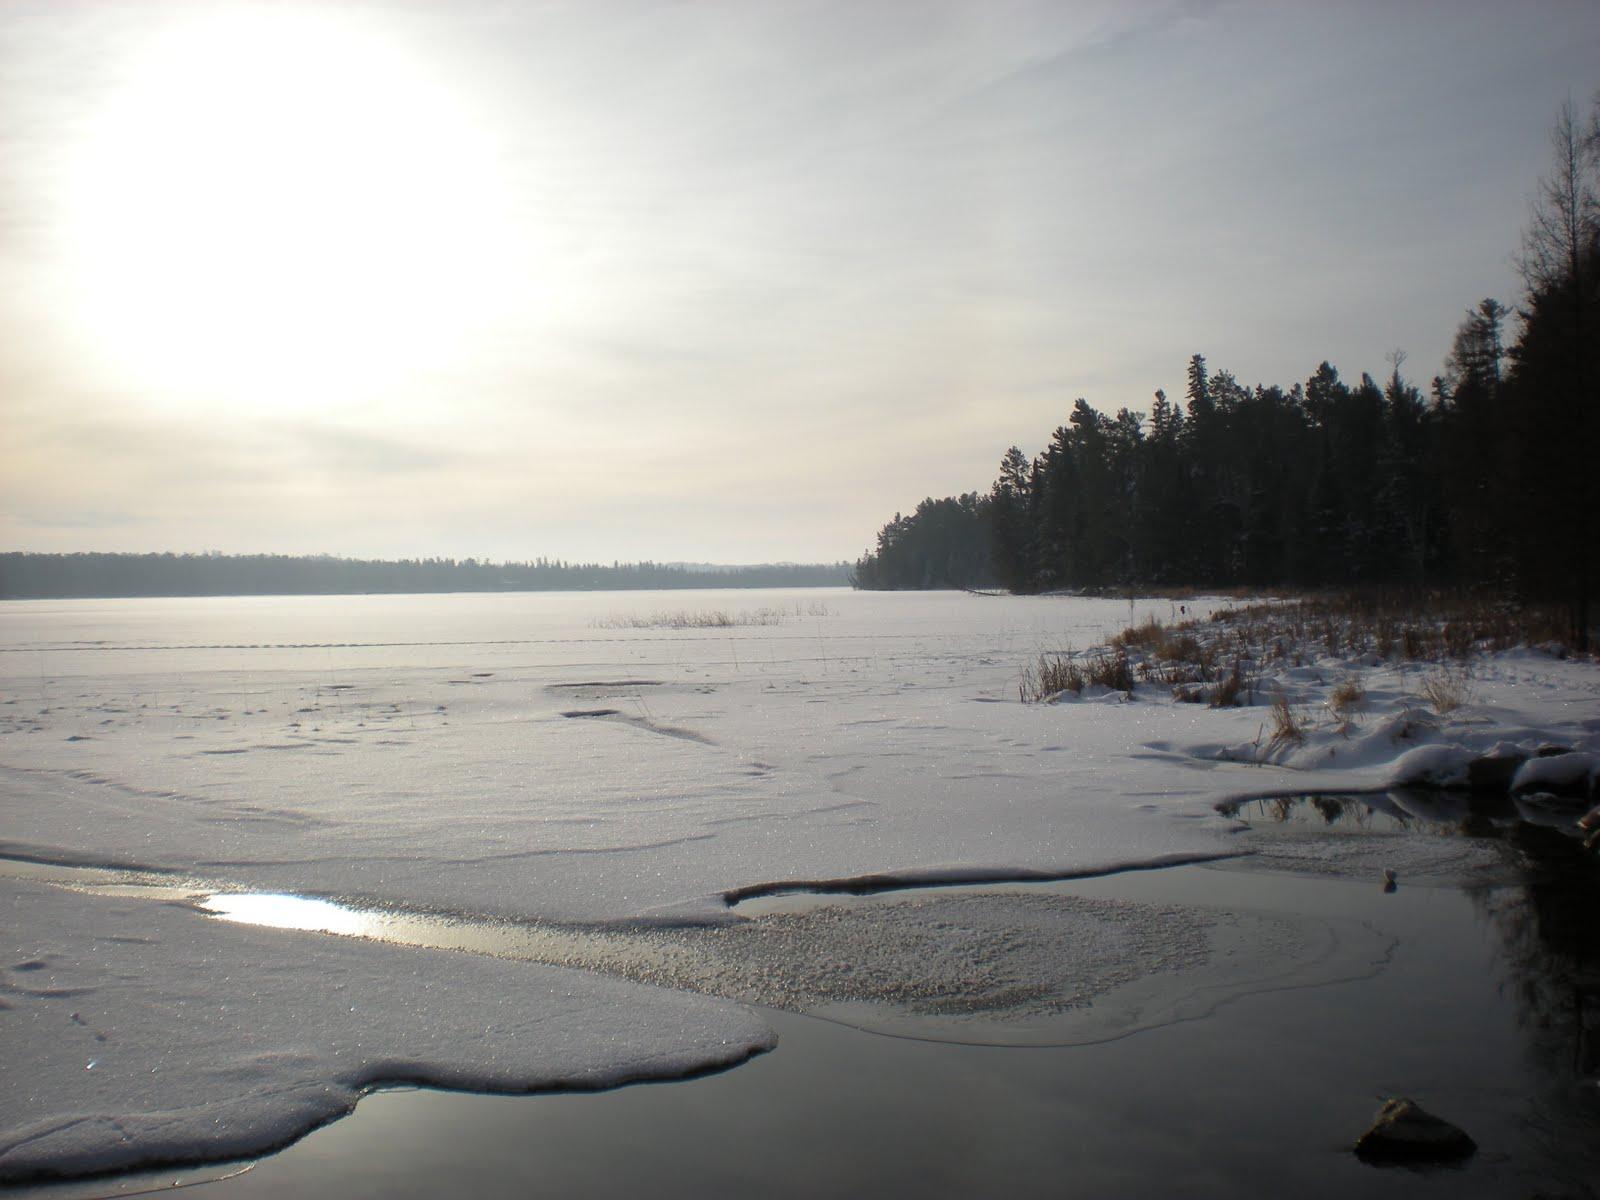 Minnesota Camping: Itasca State Park, December 2010